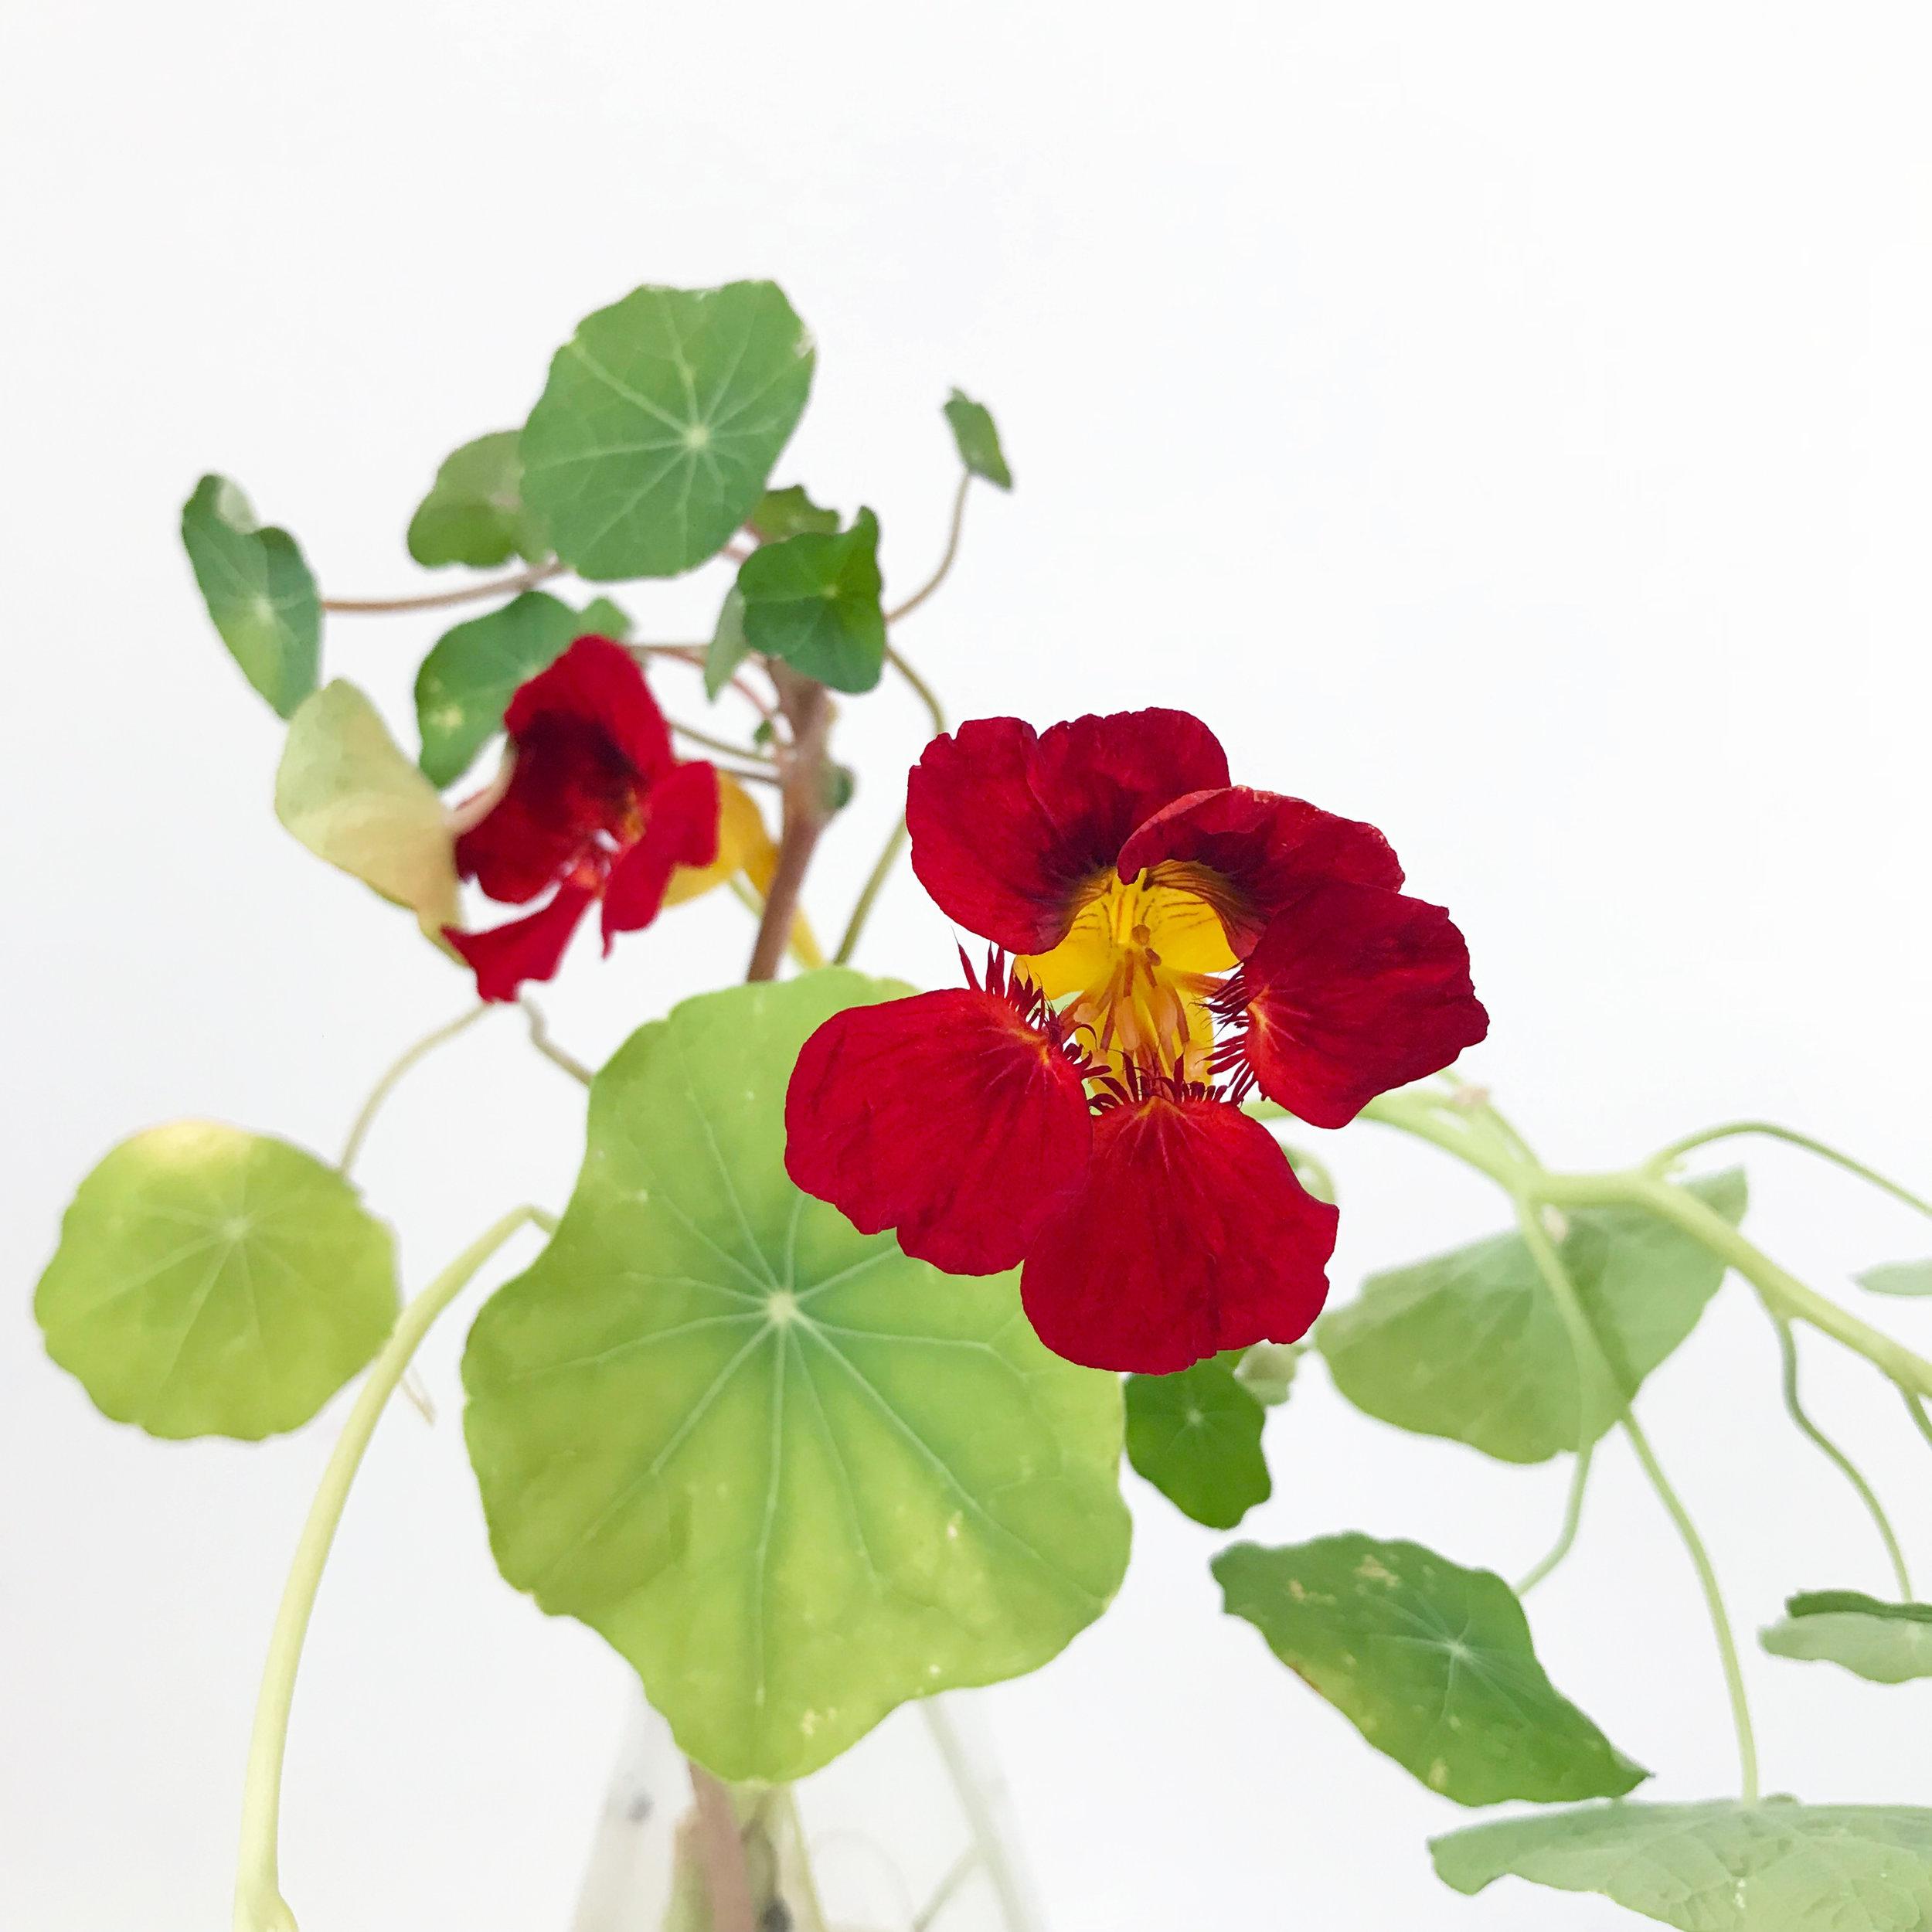 a surprise gift from my garden — nasturtium cuttings blooming in my studio in November